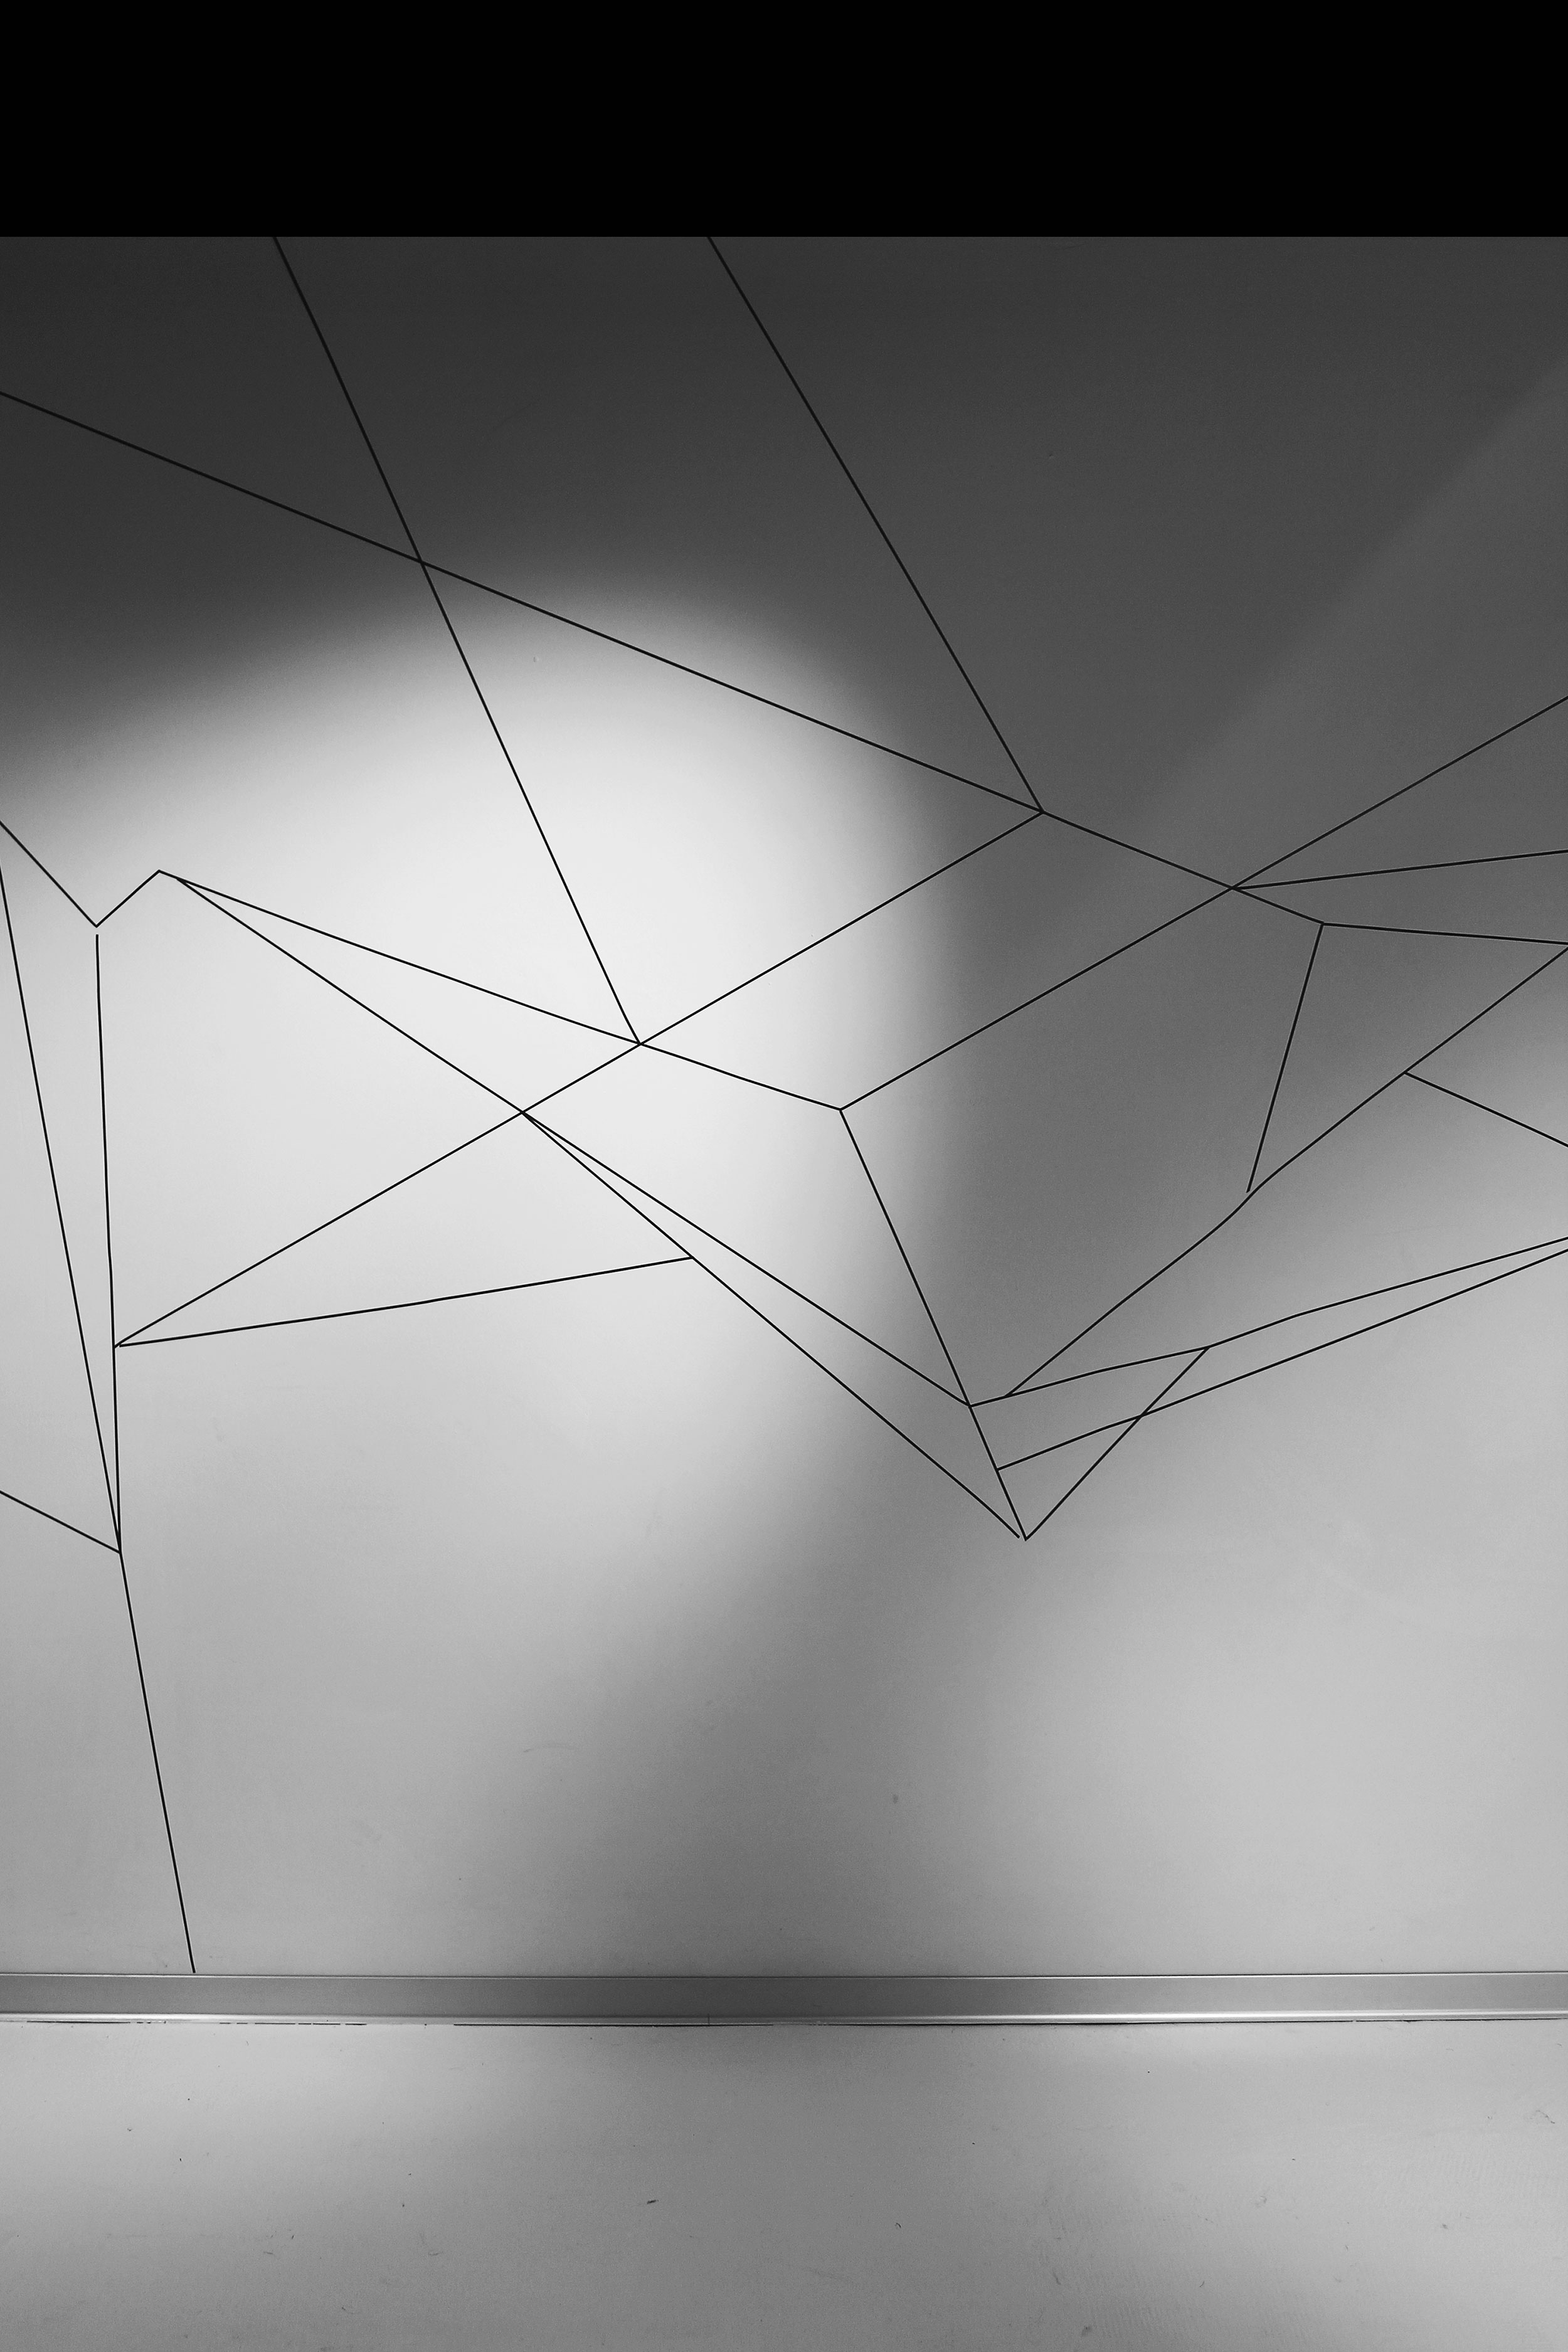 makebardo_graffiti_tapes_lines_04.jpg